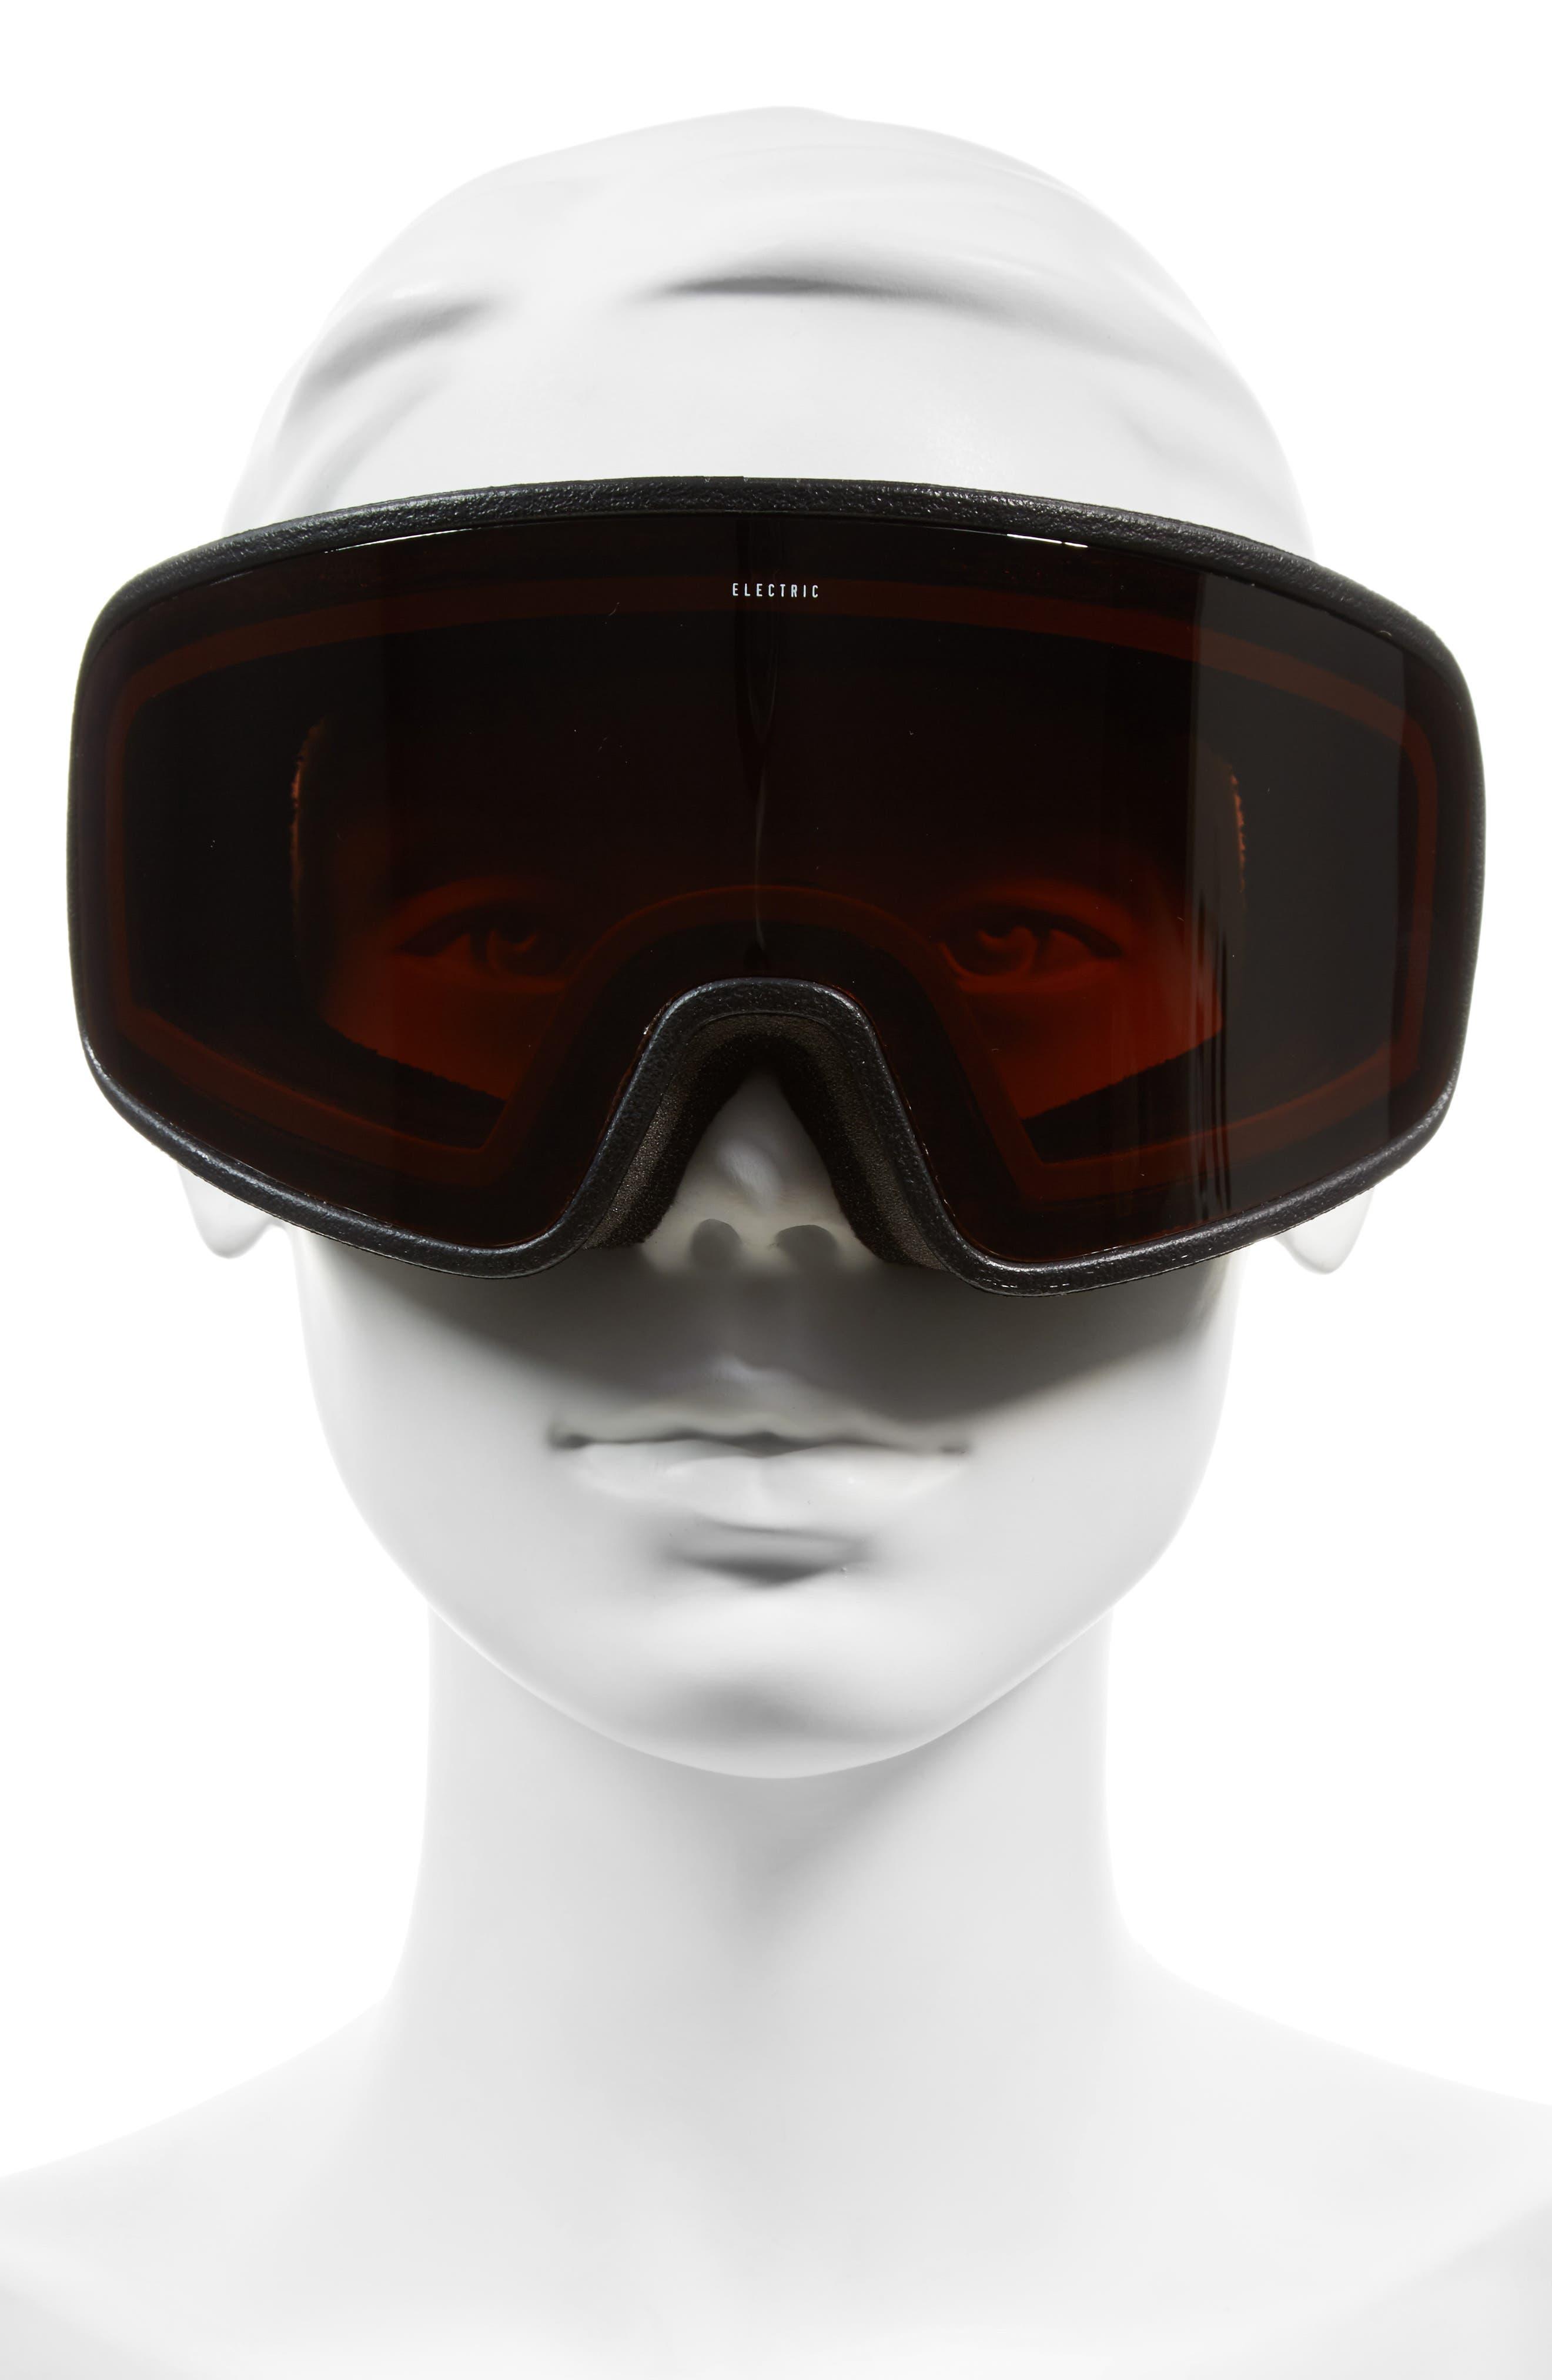 Electrolite 215mm Snow Goggles,                             Alternate thumbnail 3, color,                             002